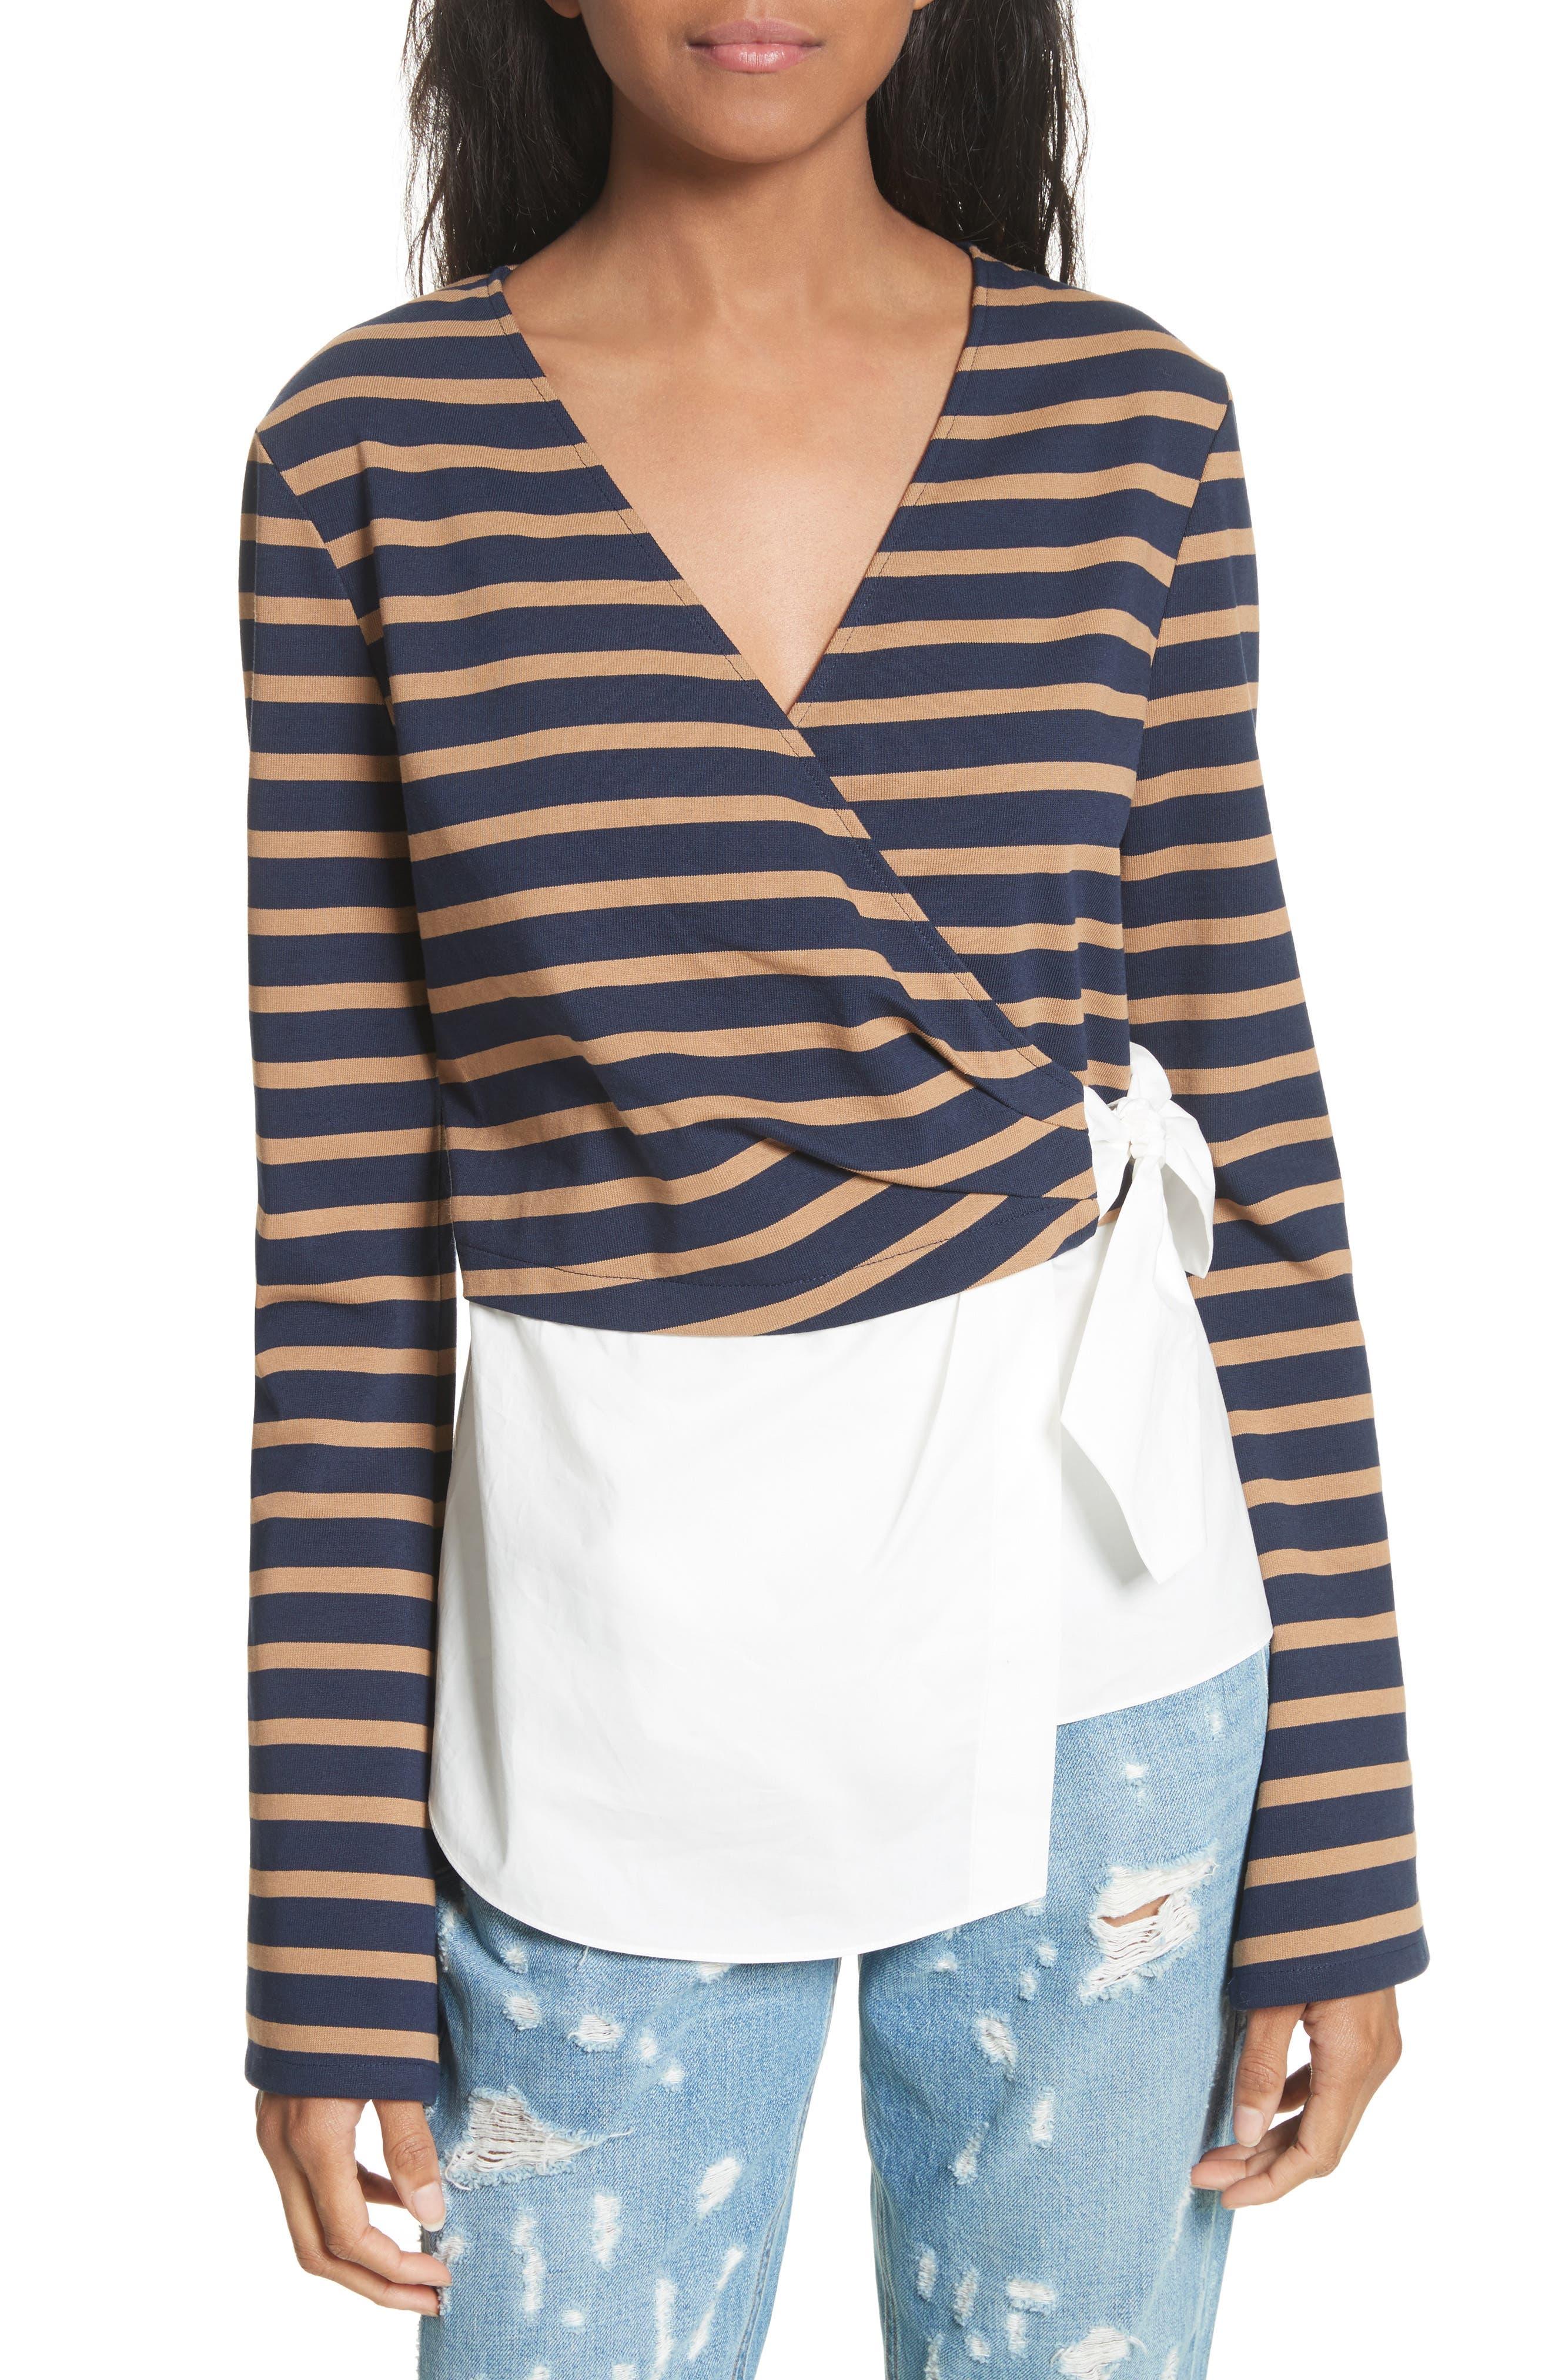 Derek Lam 10 Crosby Stripe Wrap Top with Poplin Shirting Combo